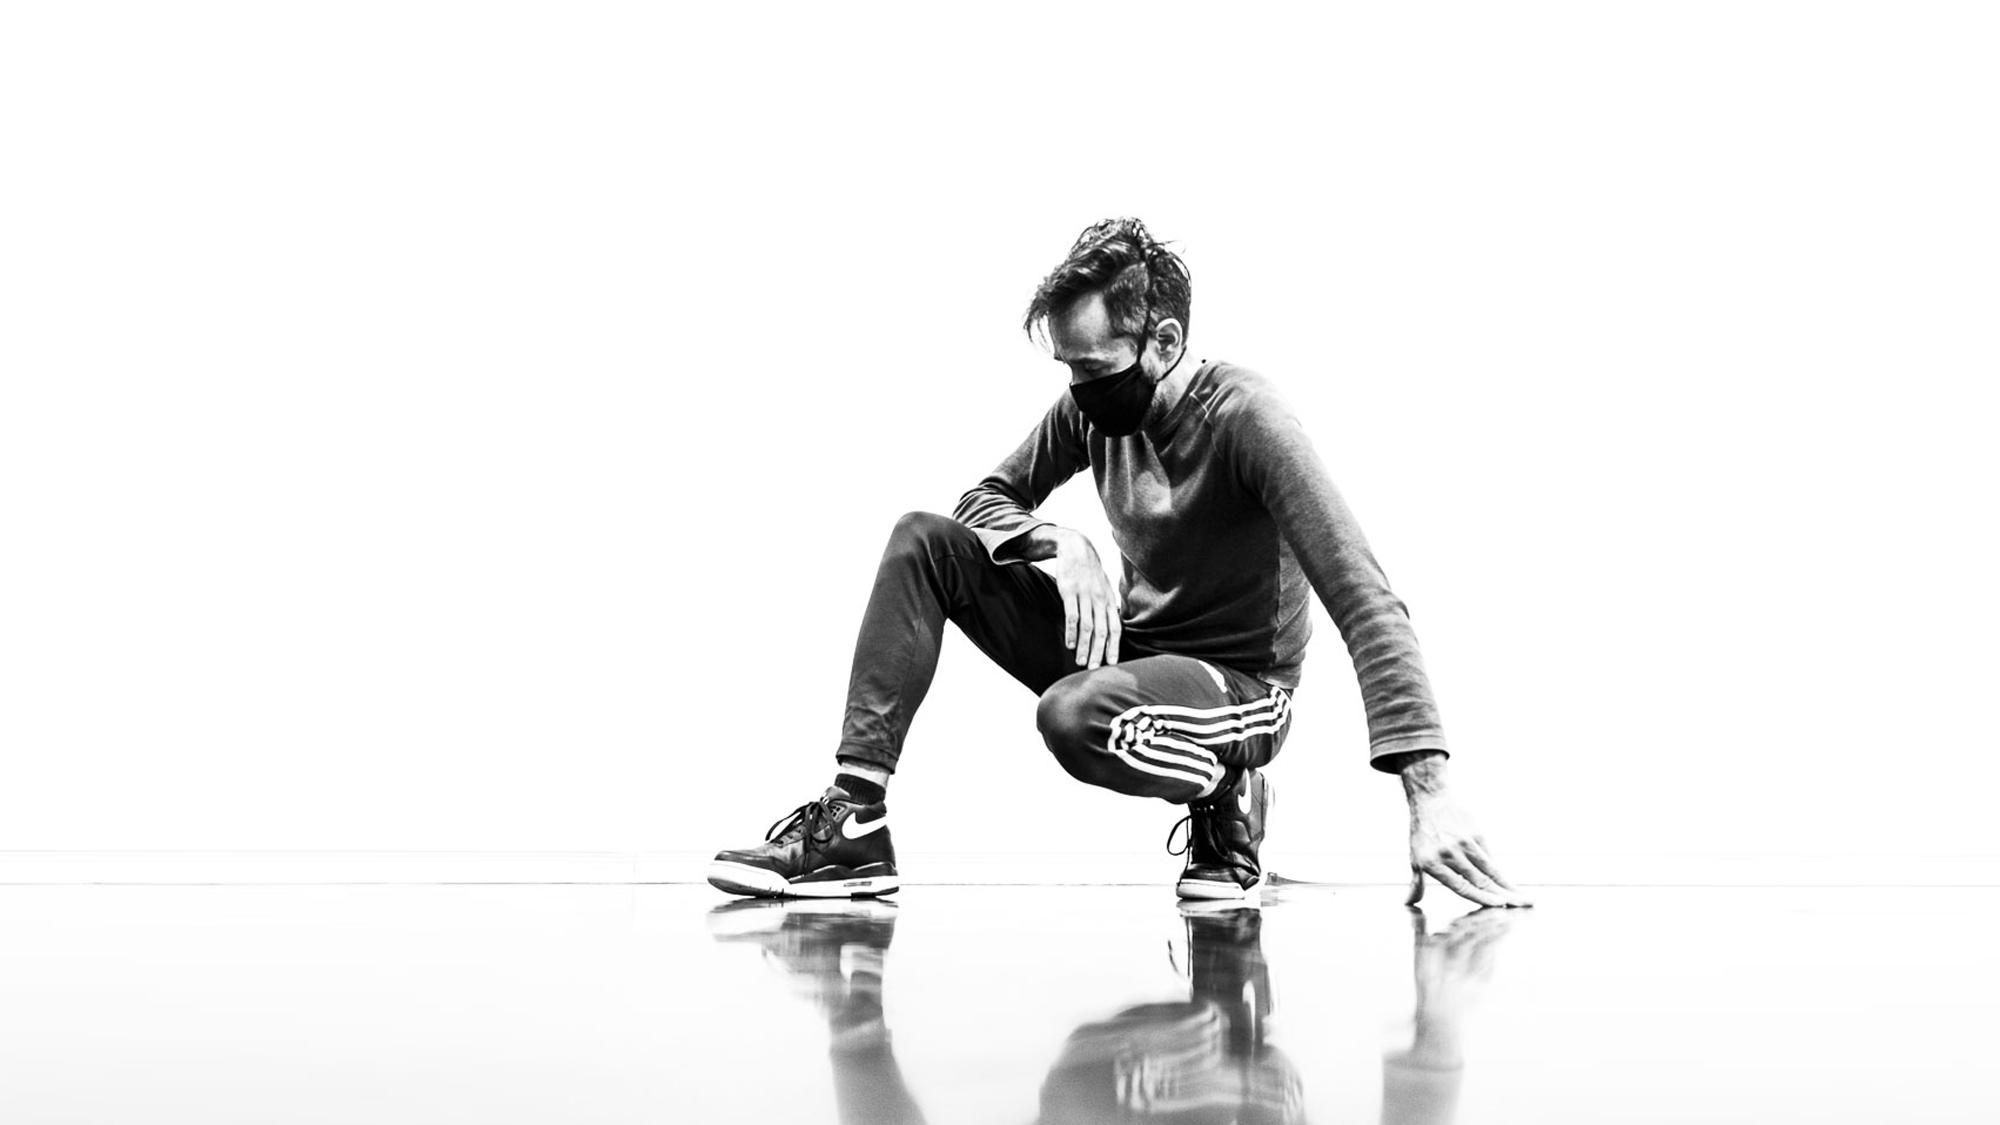 Photo © Jean-Christophe Yacono. Danseur Frédérick Gravel